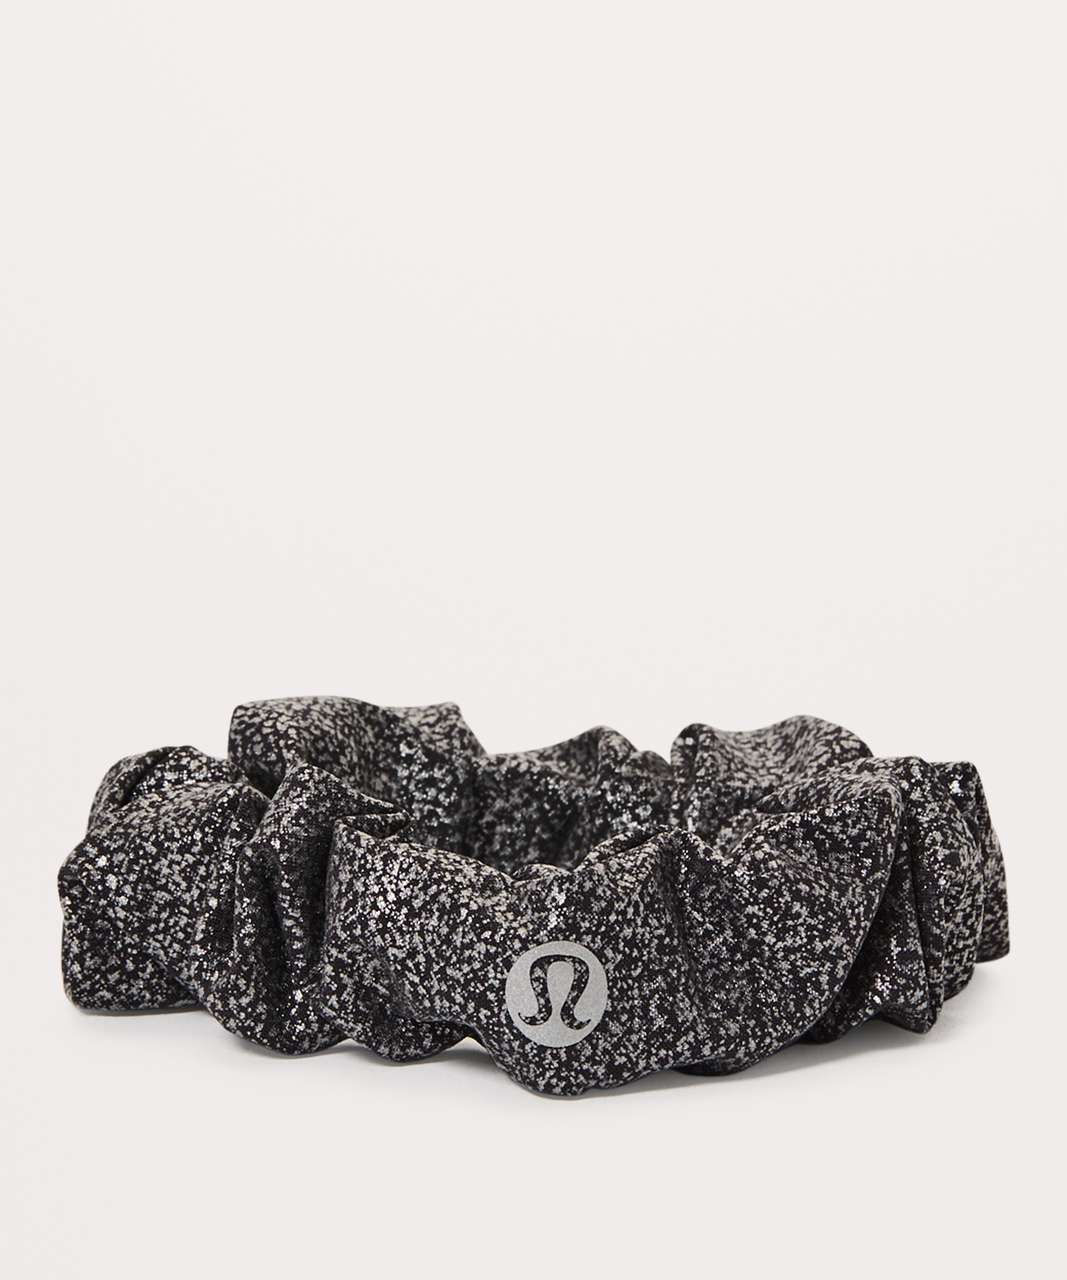 Lululemon Uplifting Scrunchie - Luminosity Foil Print Black Silver